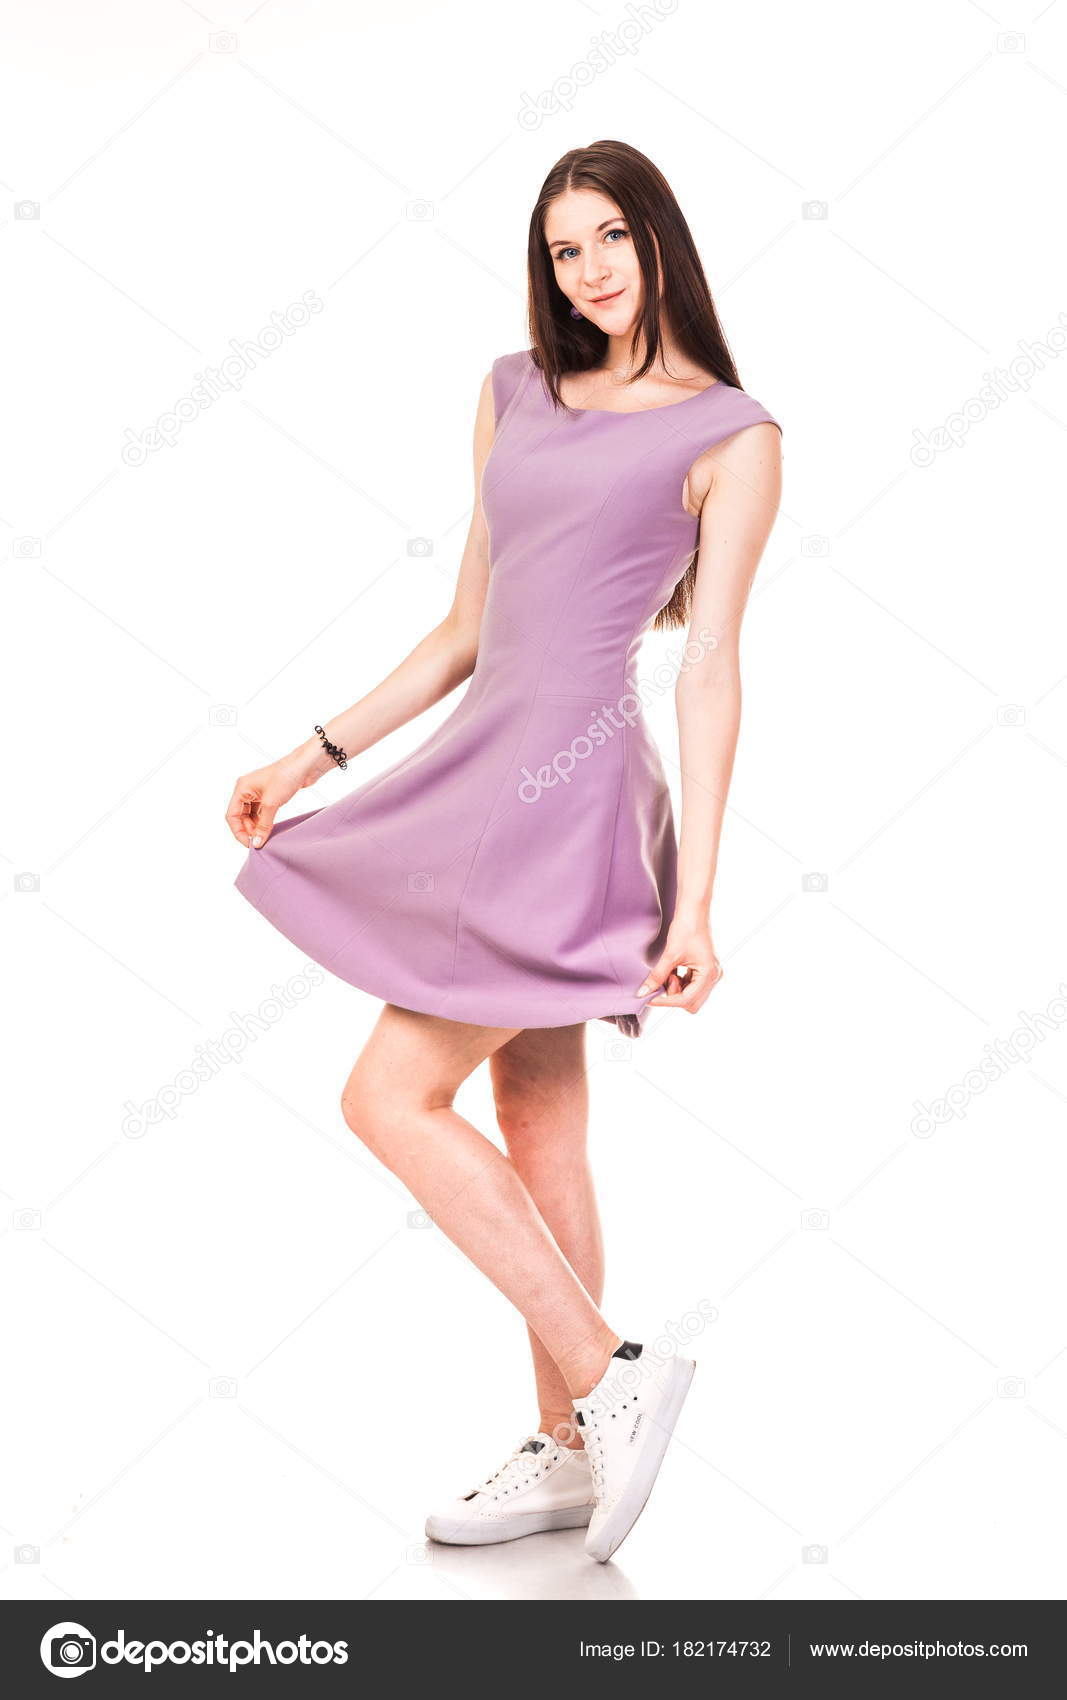 8f70827d195fc5 Mooie jonge meisje in roze jurk en sneakers. Een foto op een witte  achtergrond